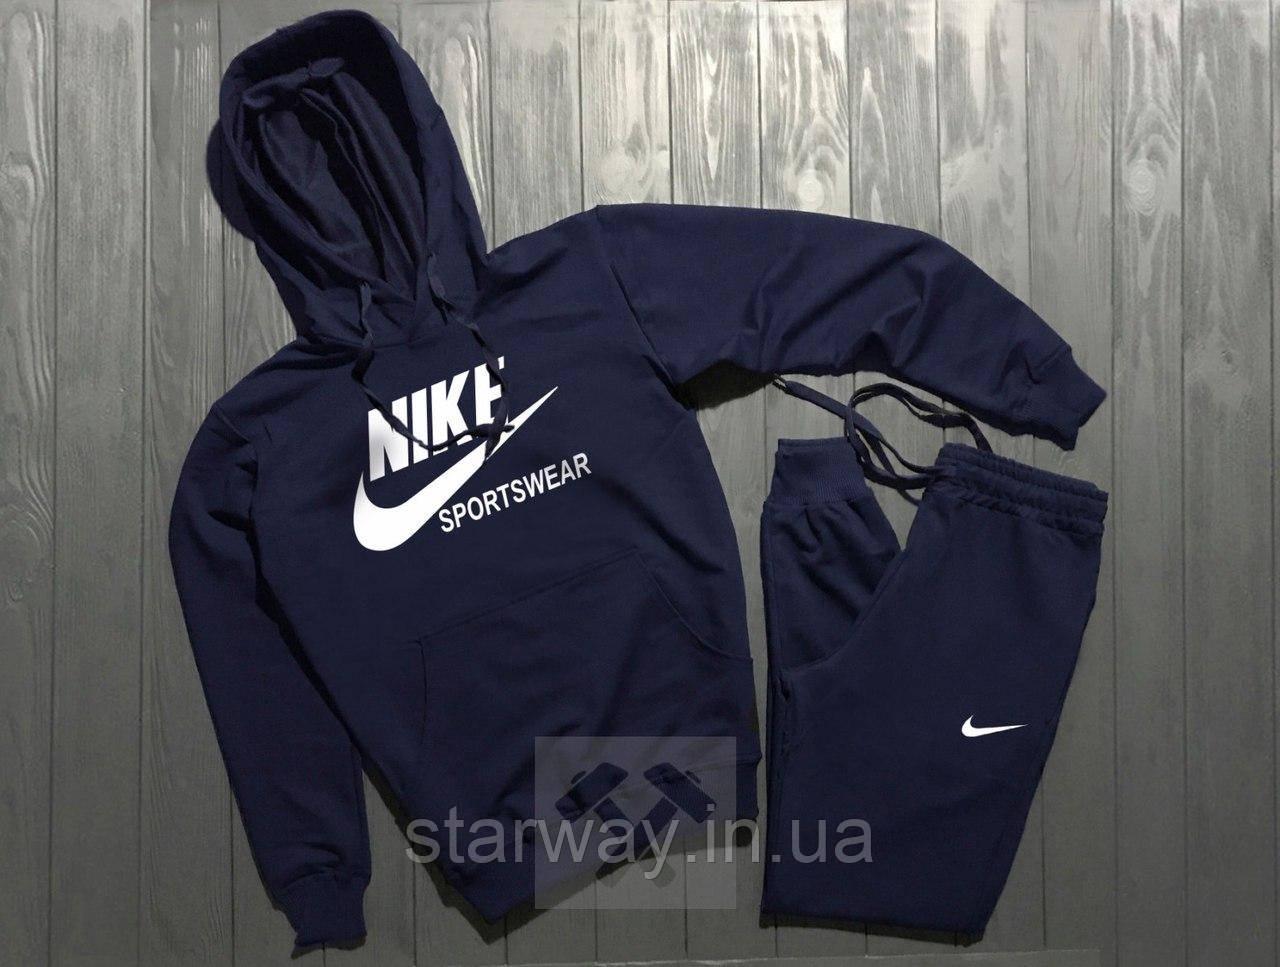 Спортивный трикотажный костюм Nike с капюшоном | sportswear лого